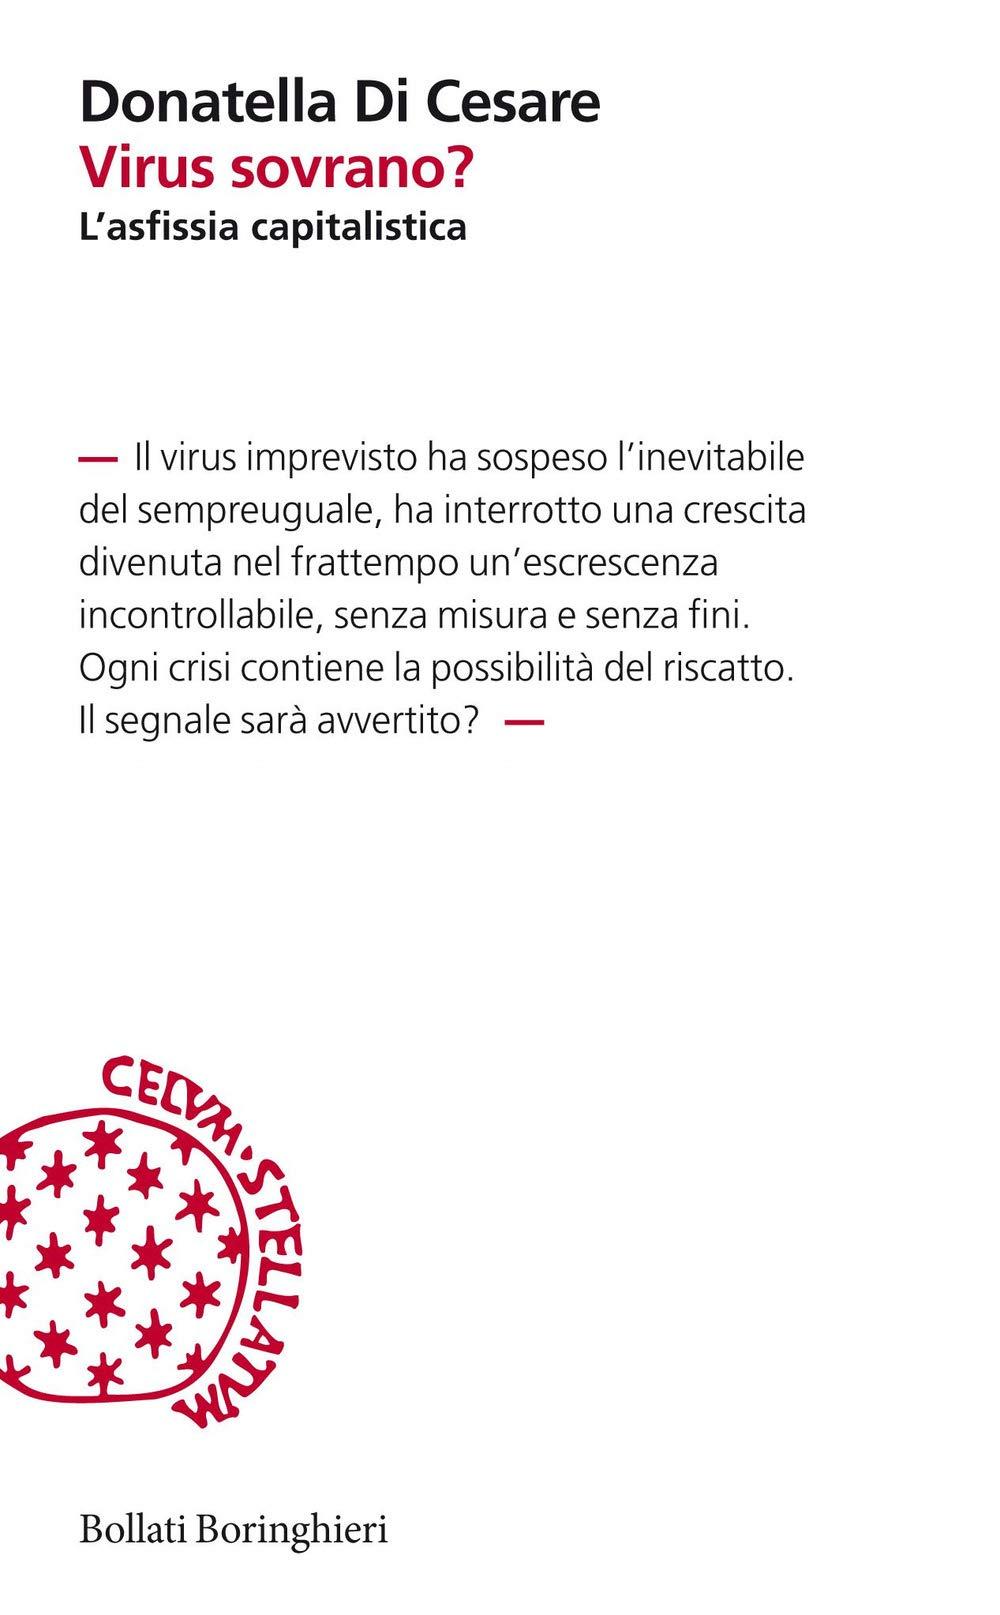 Virus sovrano? Lasfissia capitalistica (Incipit): Amazon.es: Di Cesare, Donatella: Libros en idiomas extranjeros